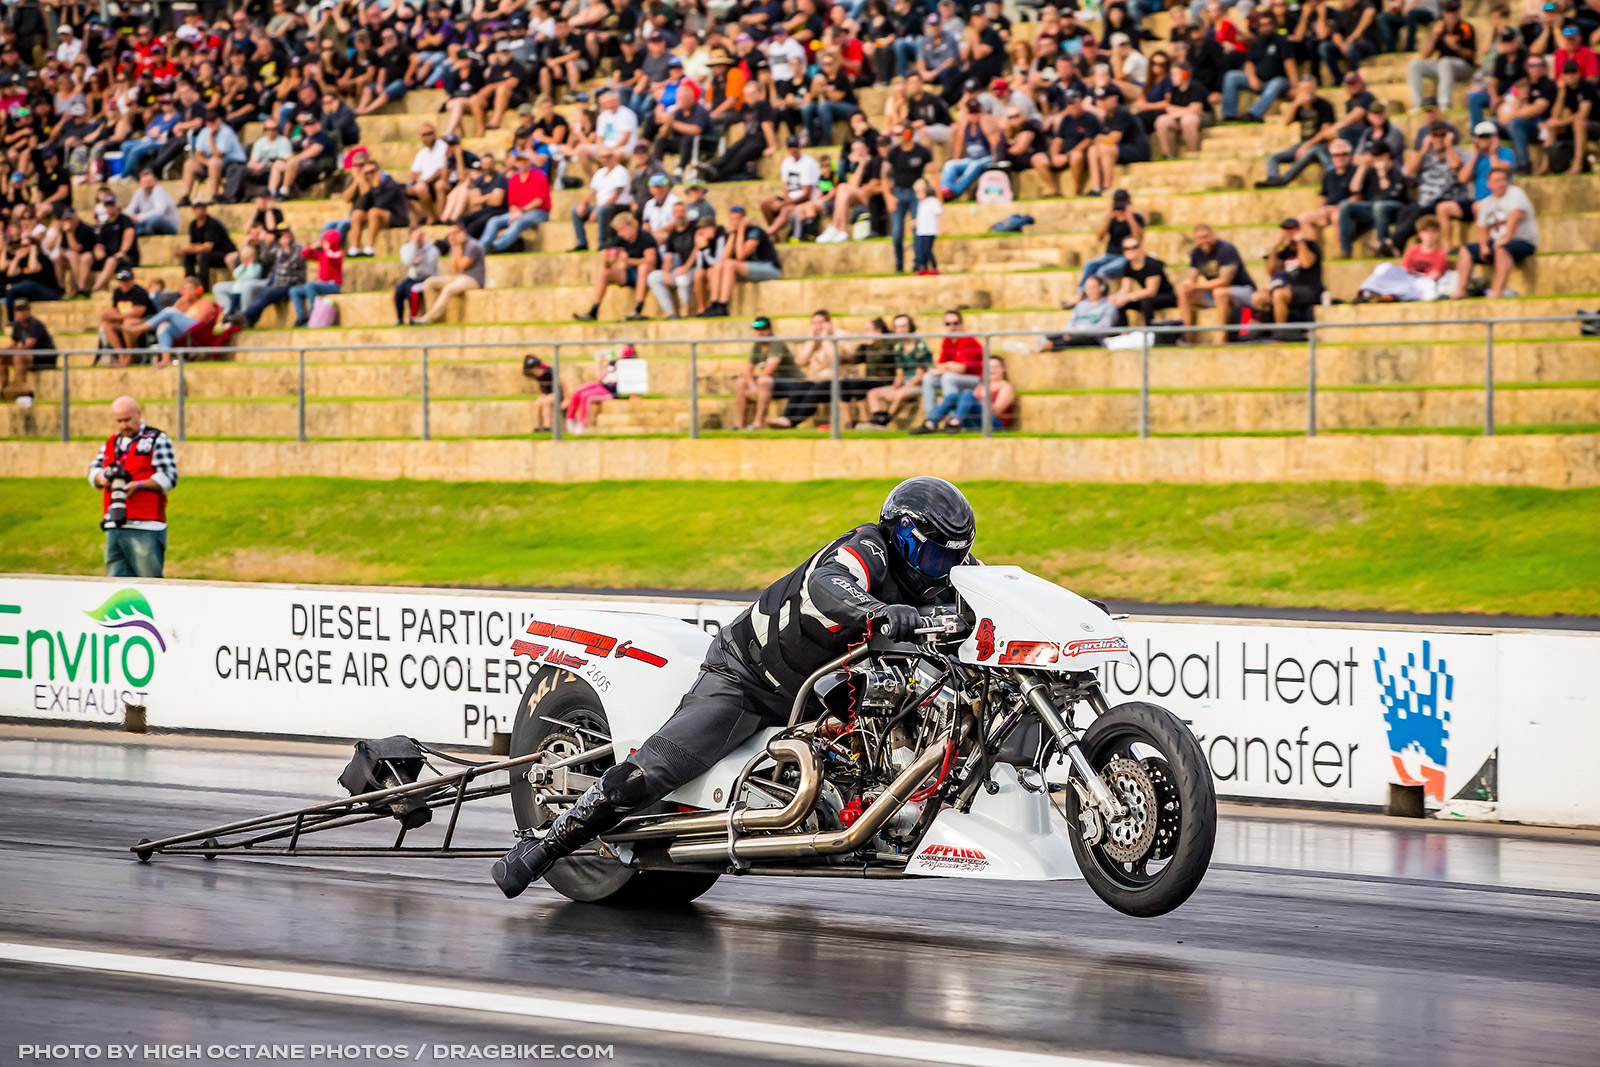 ANDRA Top Fuel Motorcycle Benny Stevens